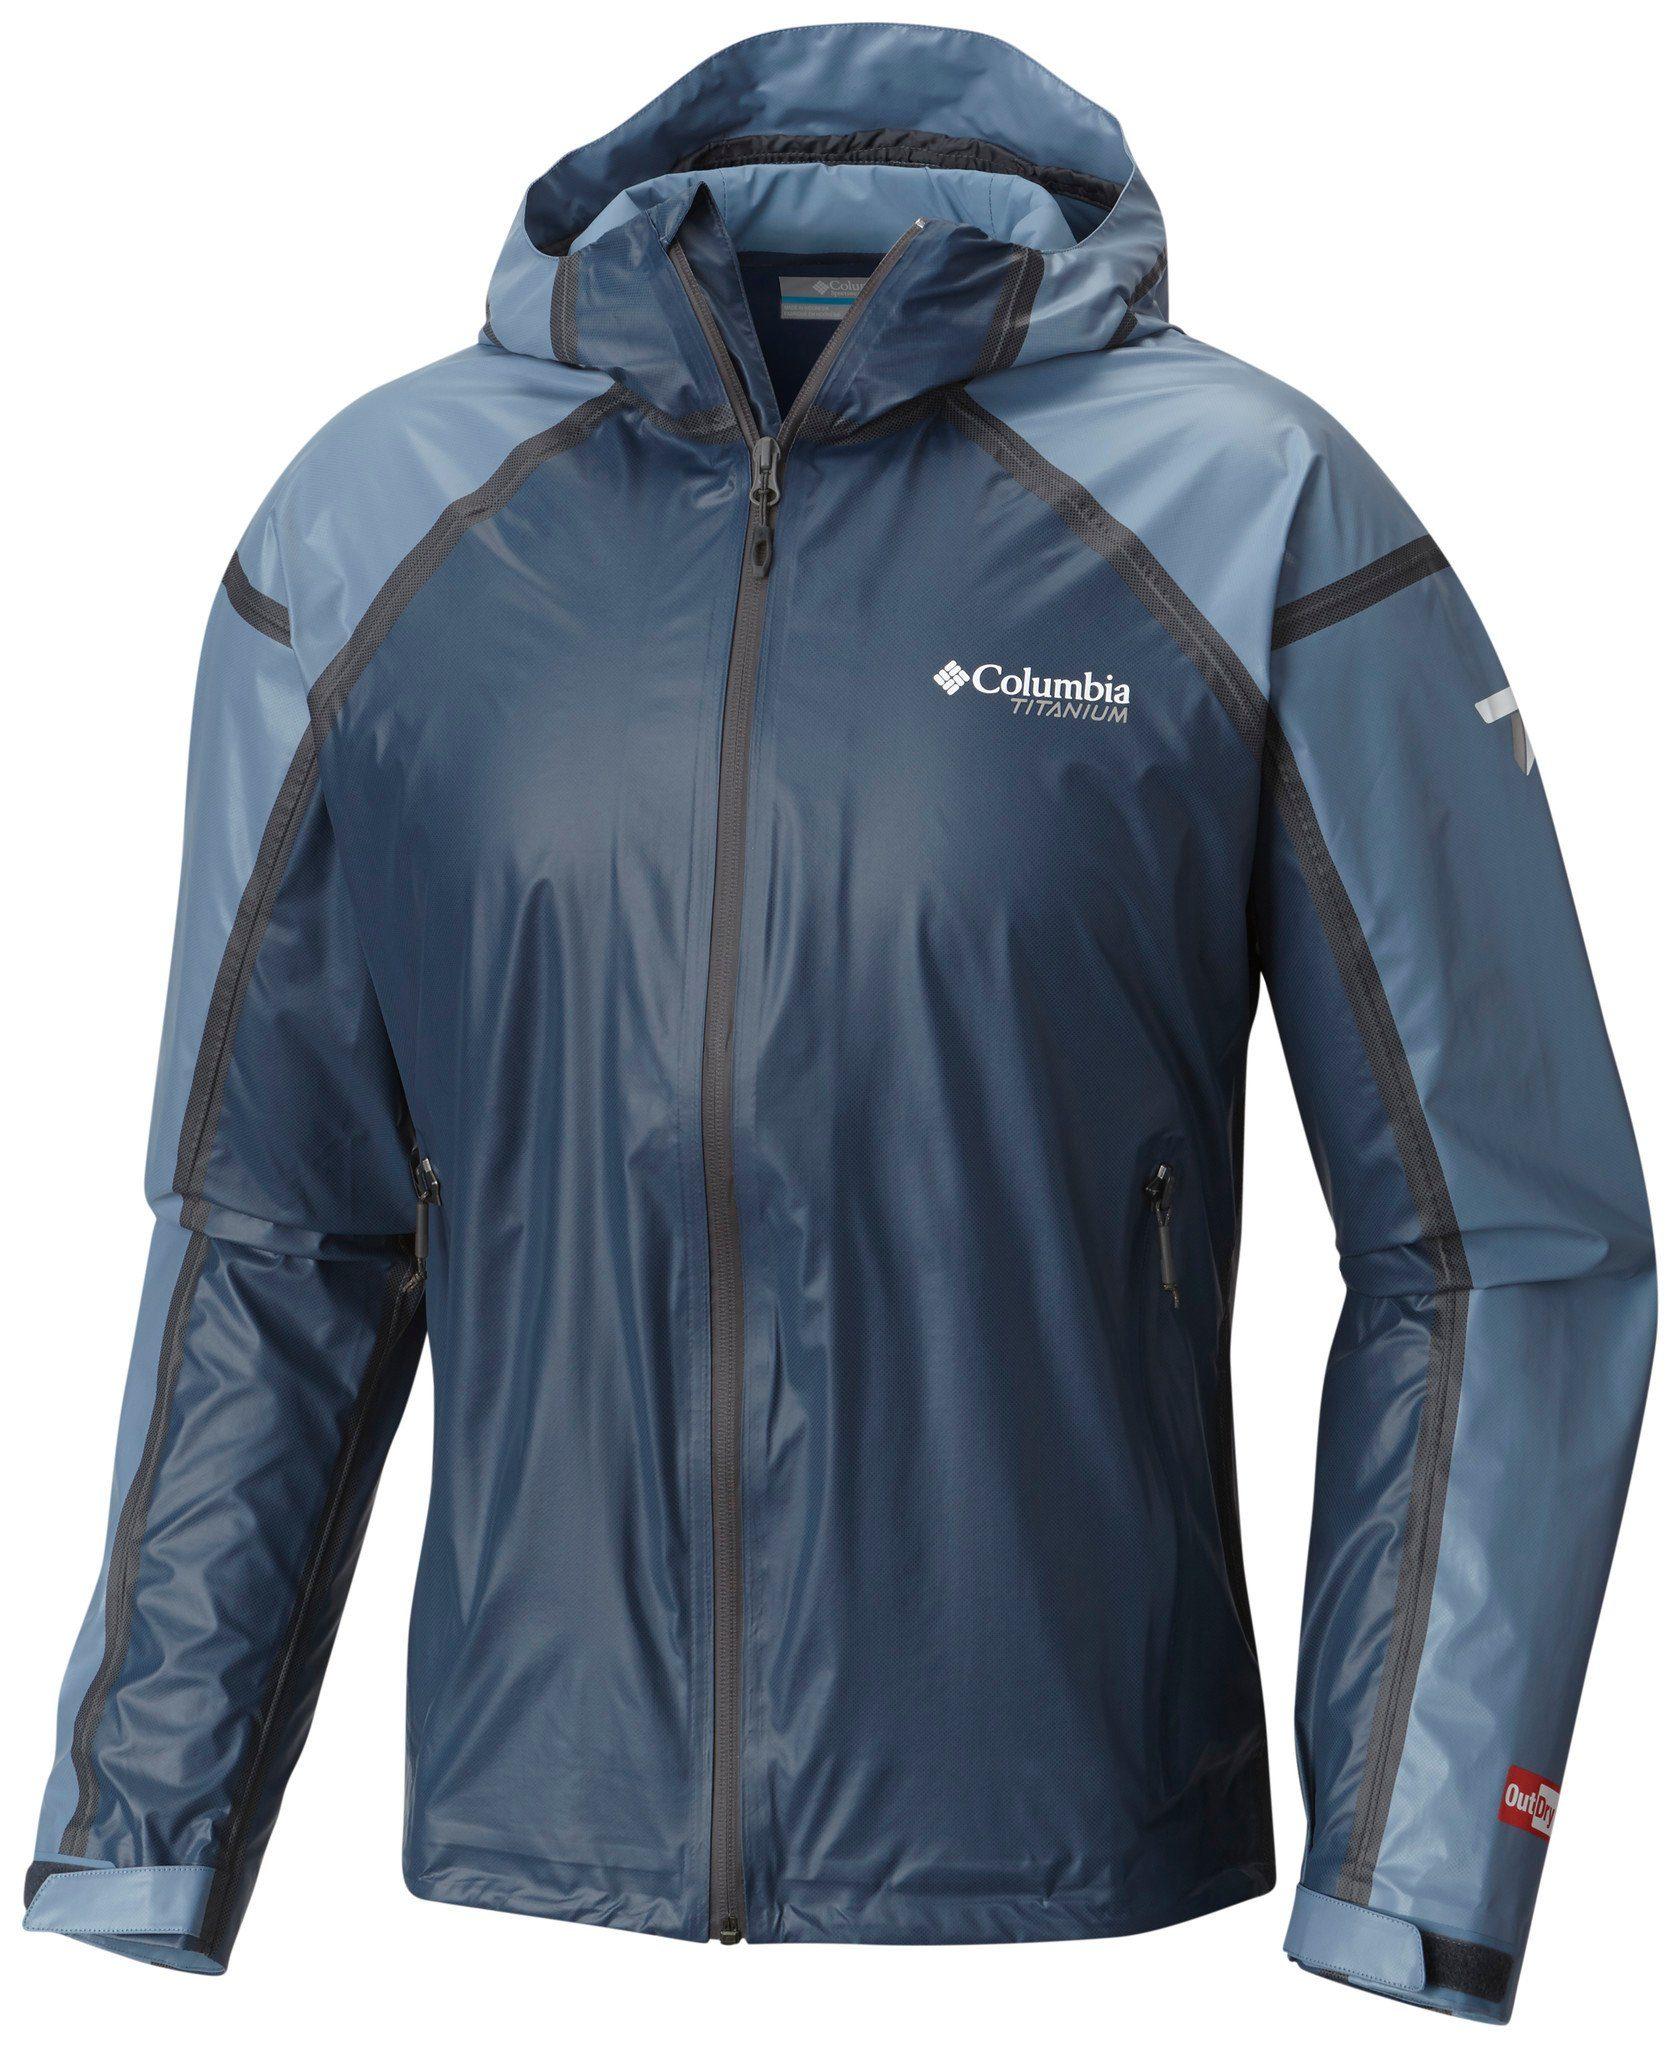 Columbia Outdoorjacke »Outdry Ex Gold Tech Shell Jacket Men«